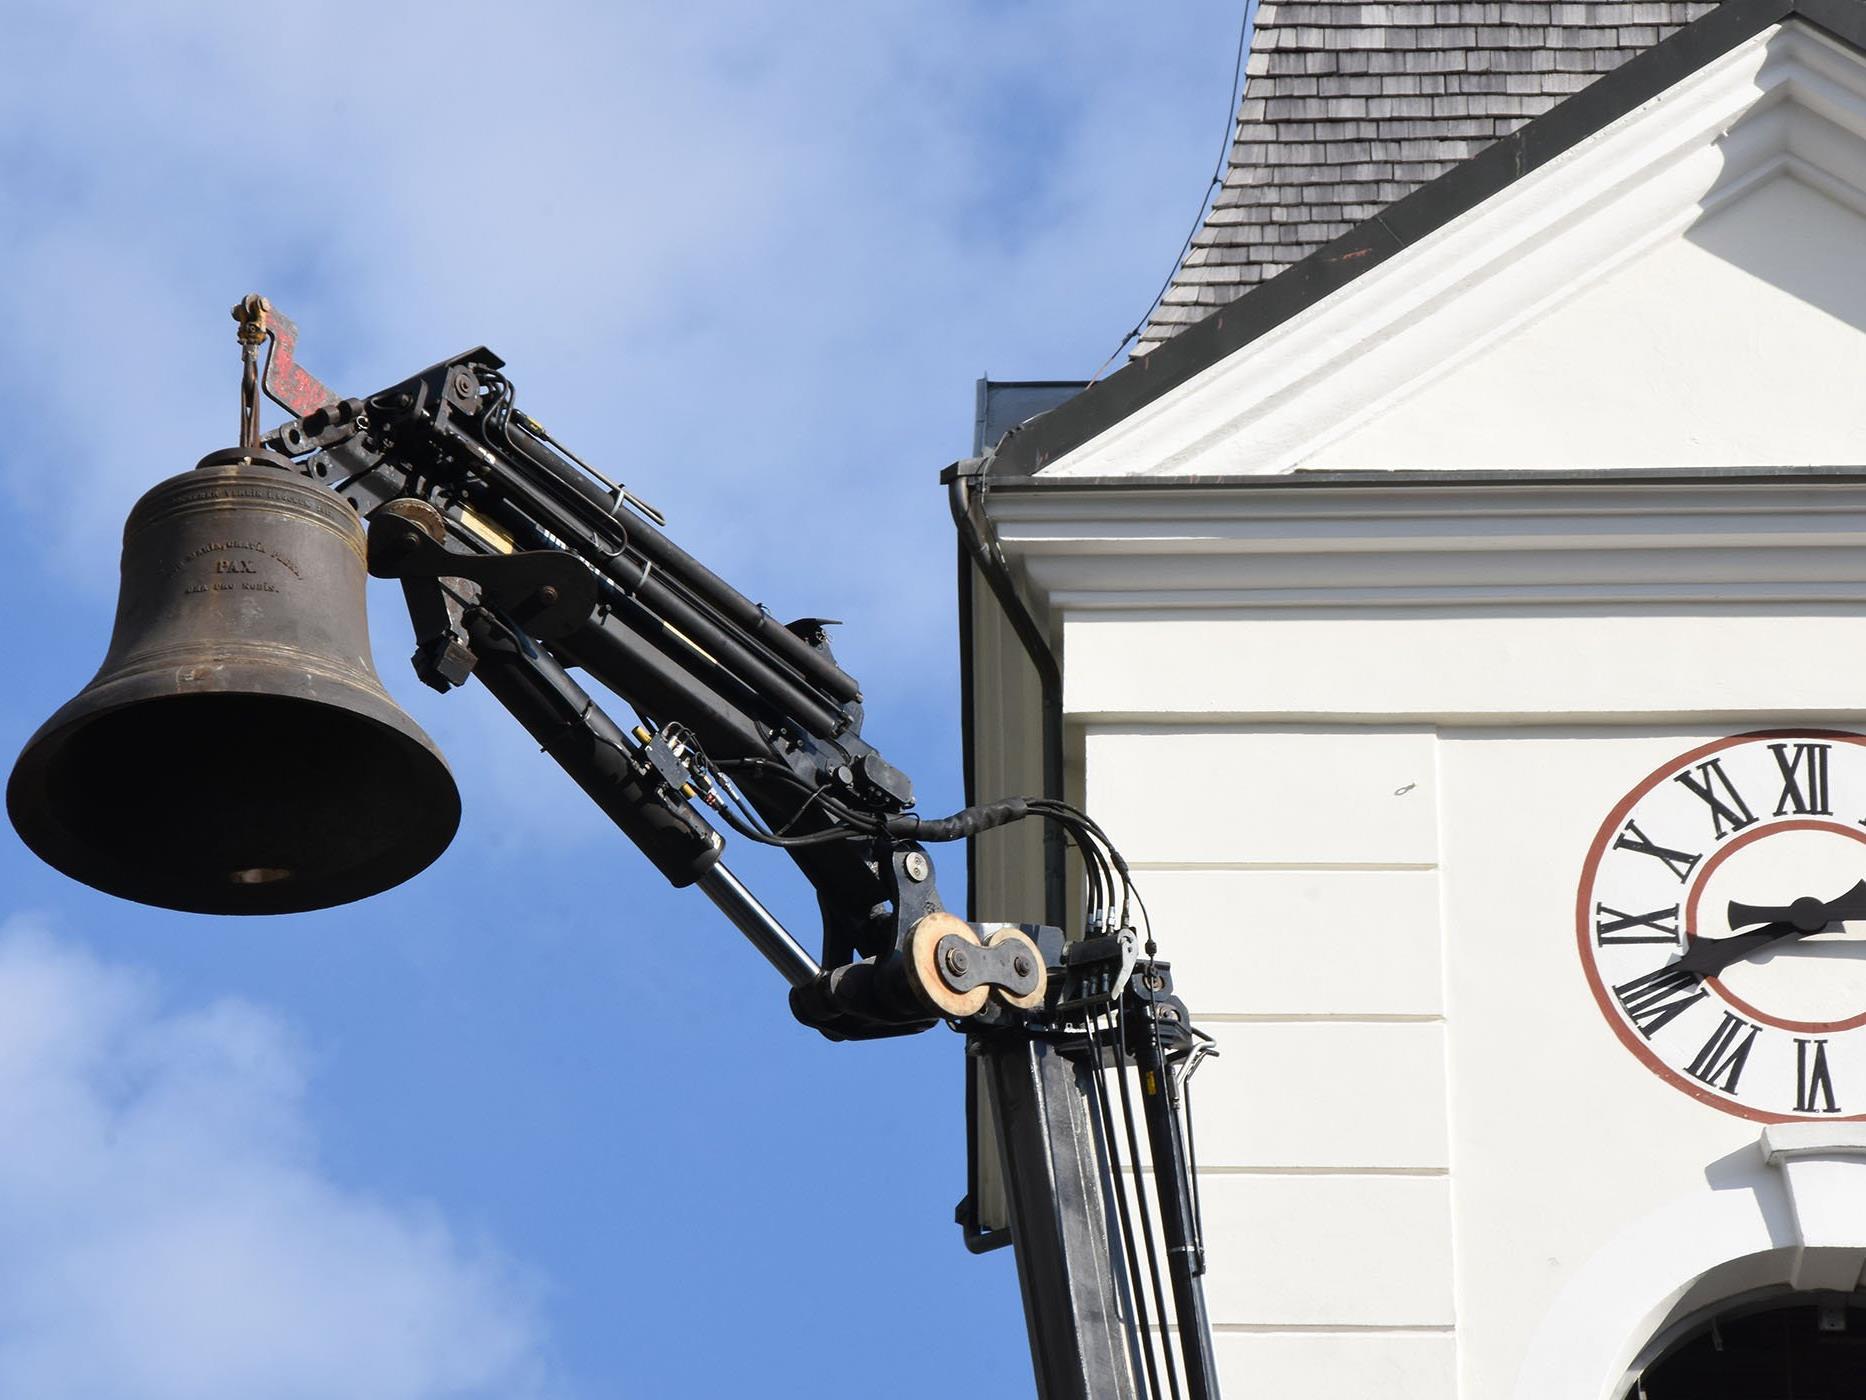 Glockenabnahme in Nüziders